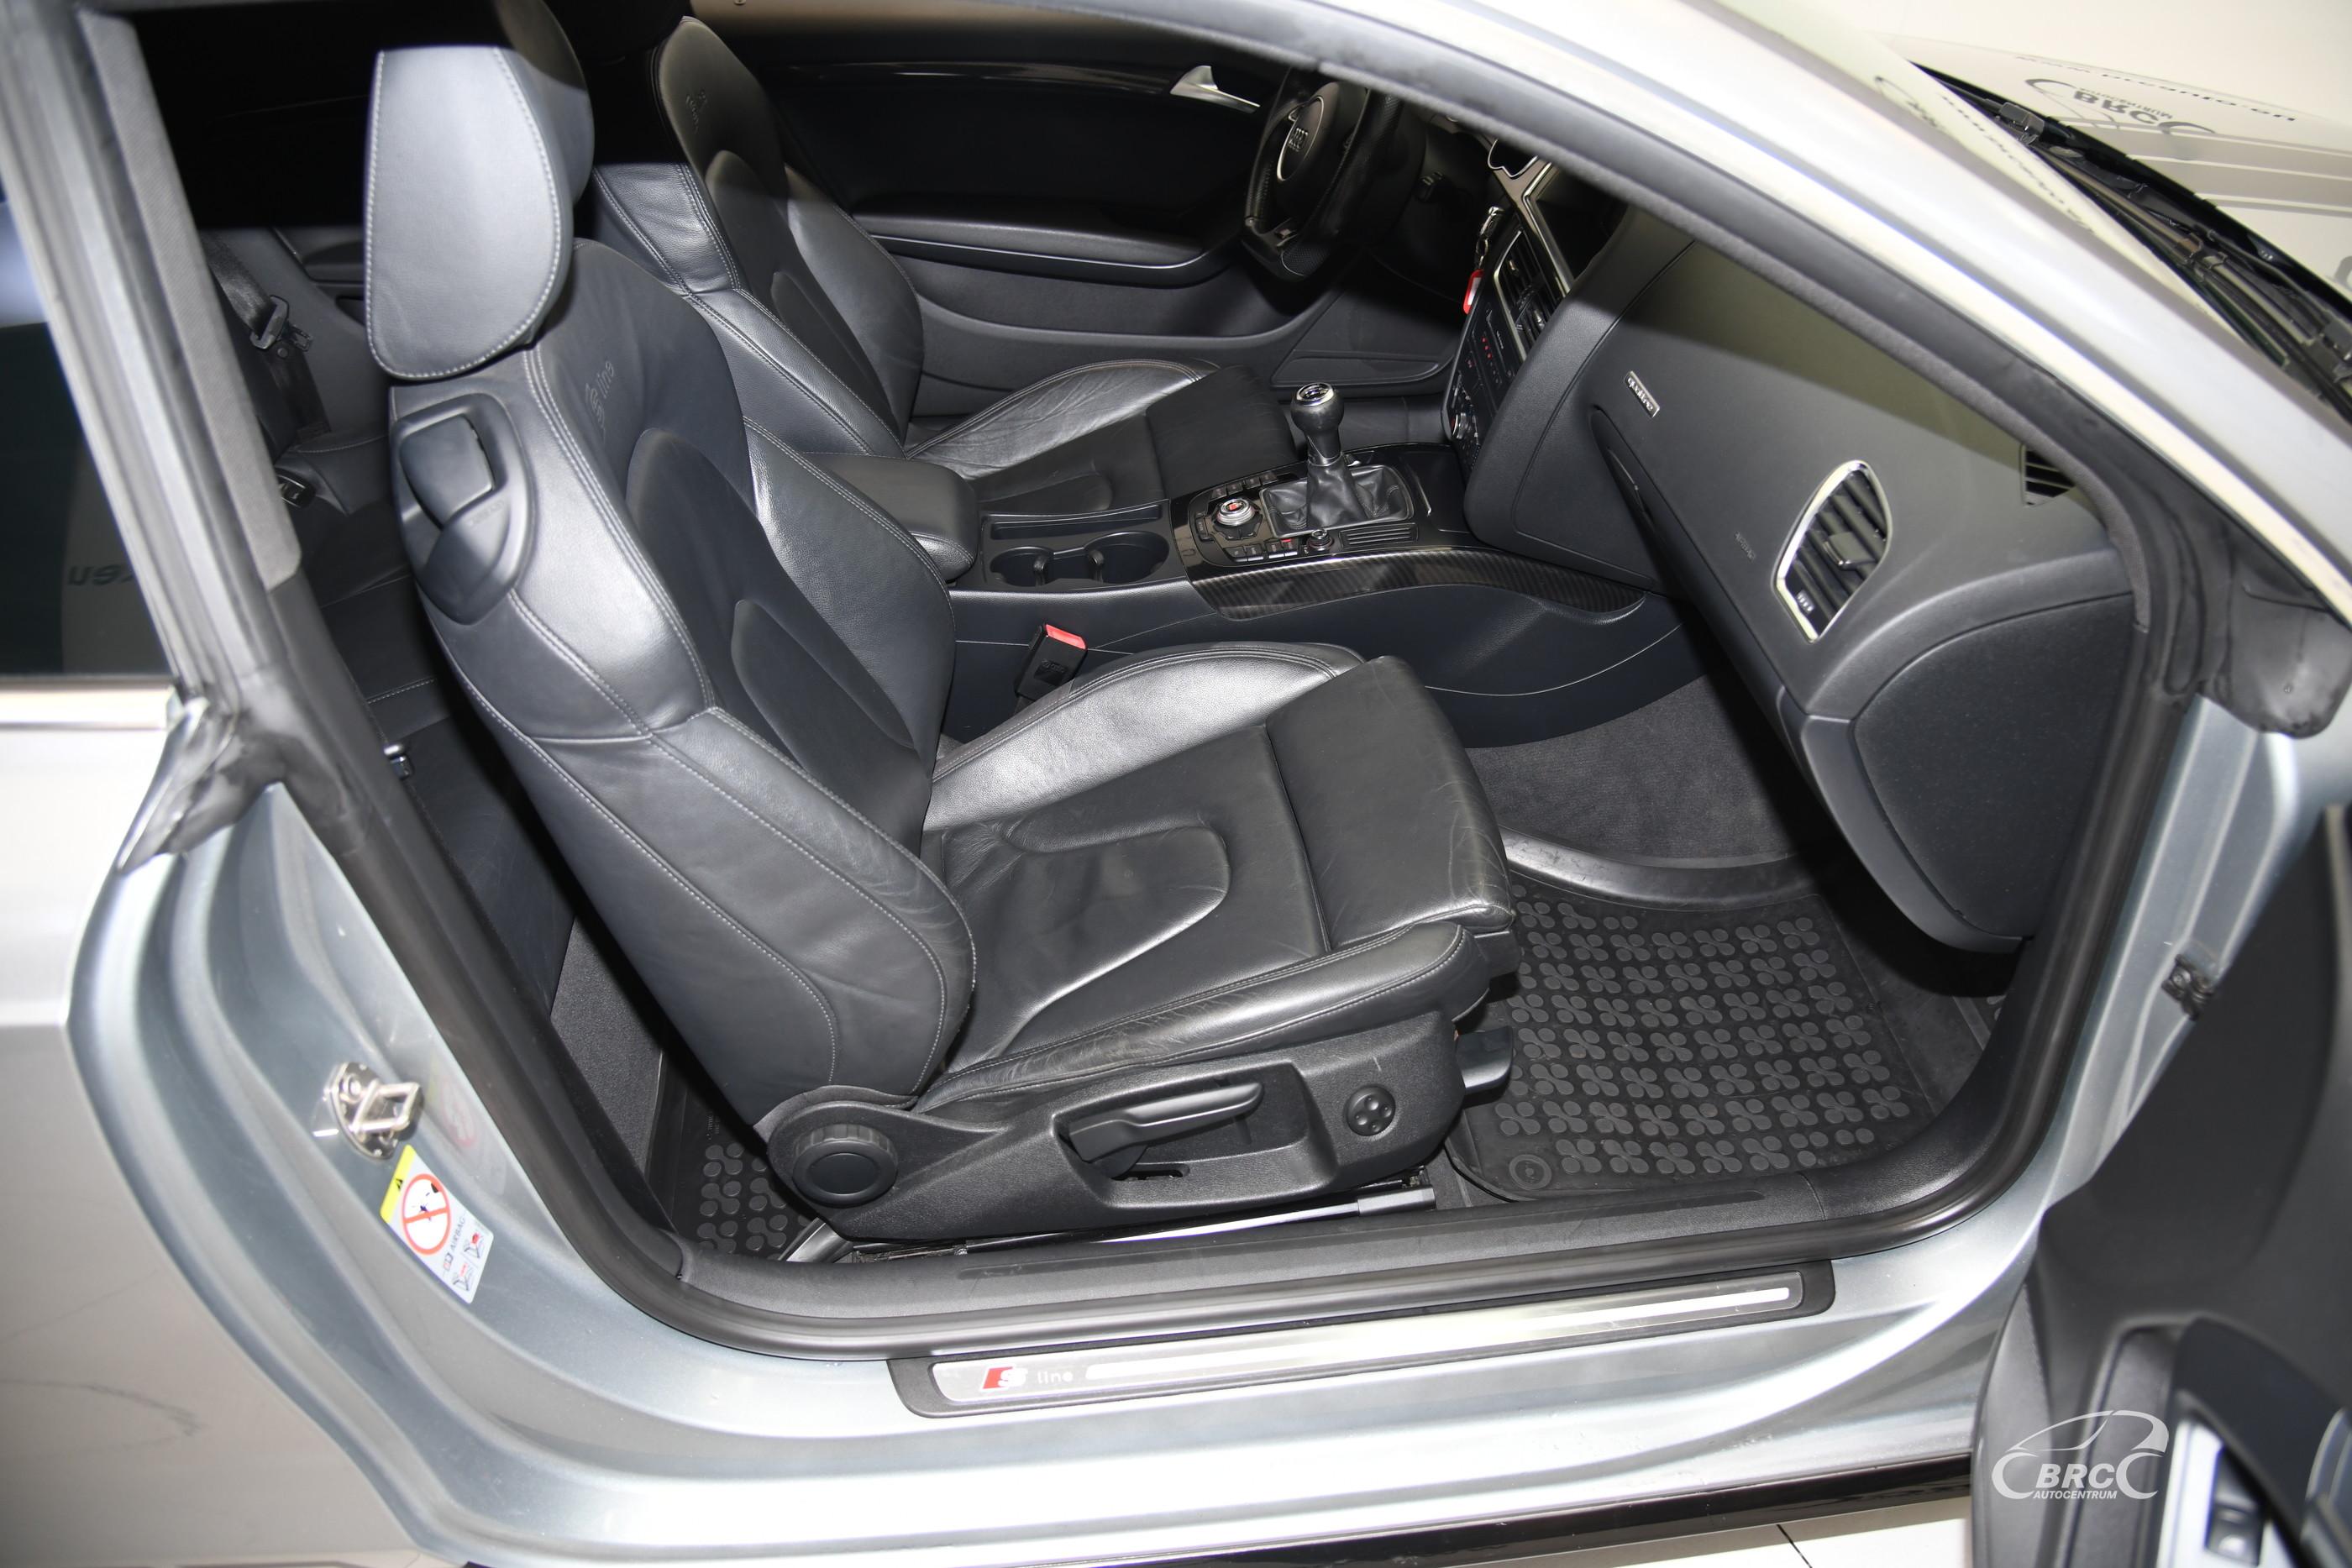 Audi A5 3.0 TDI S-Line Quattro